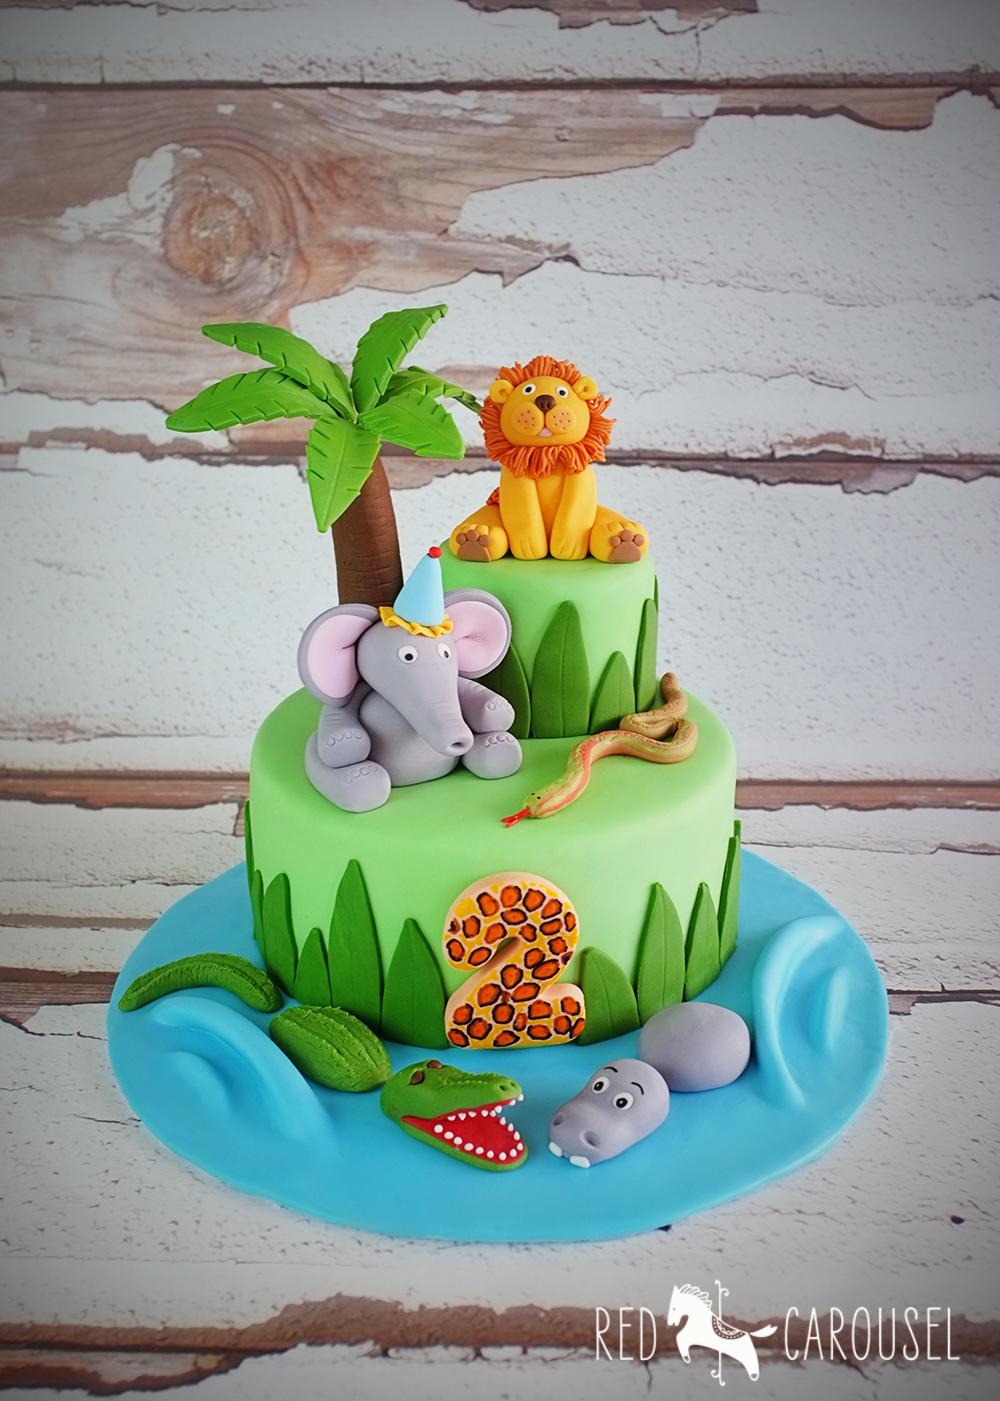 Jungle Birthday Cakes on Pinterest Jungle Cake, Jungle ...